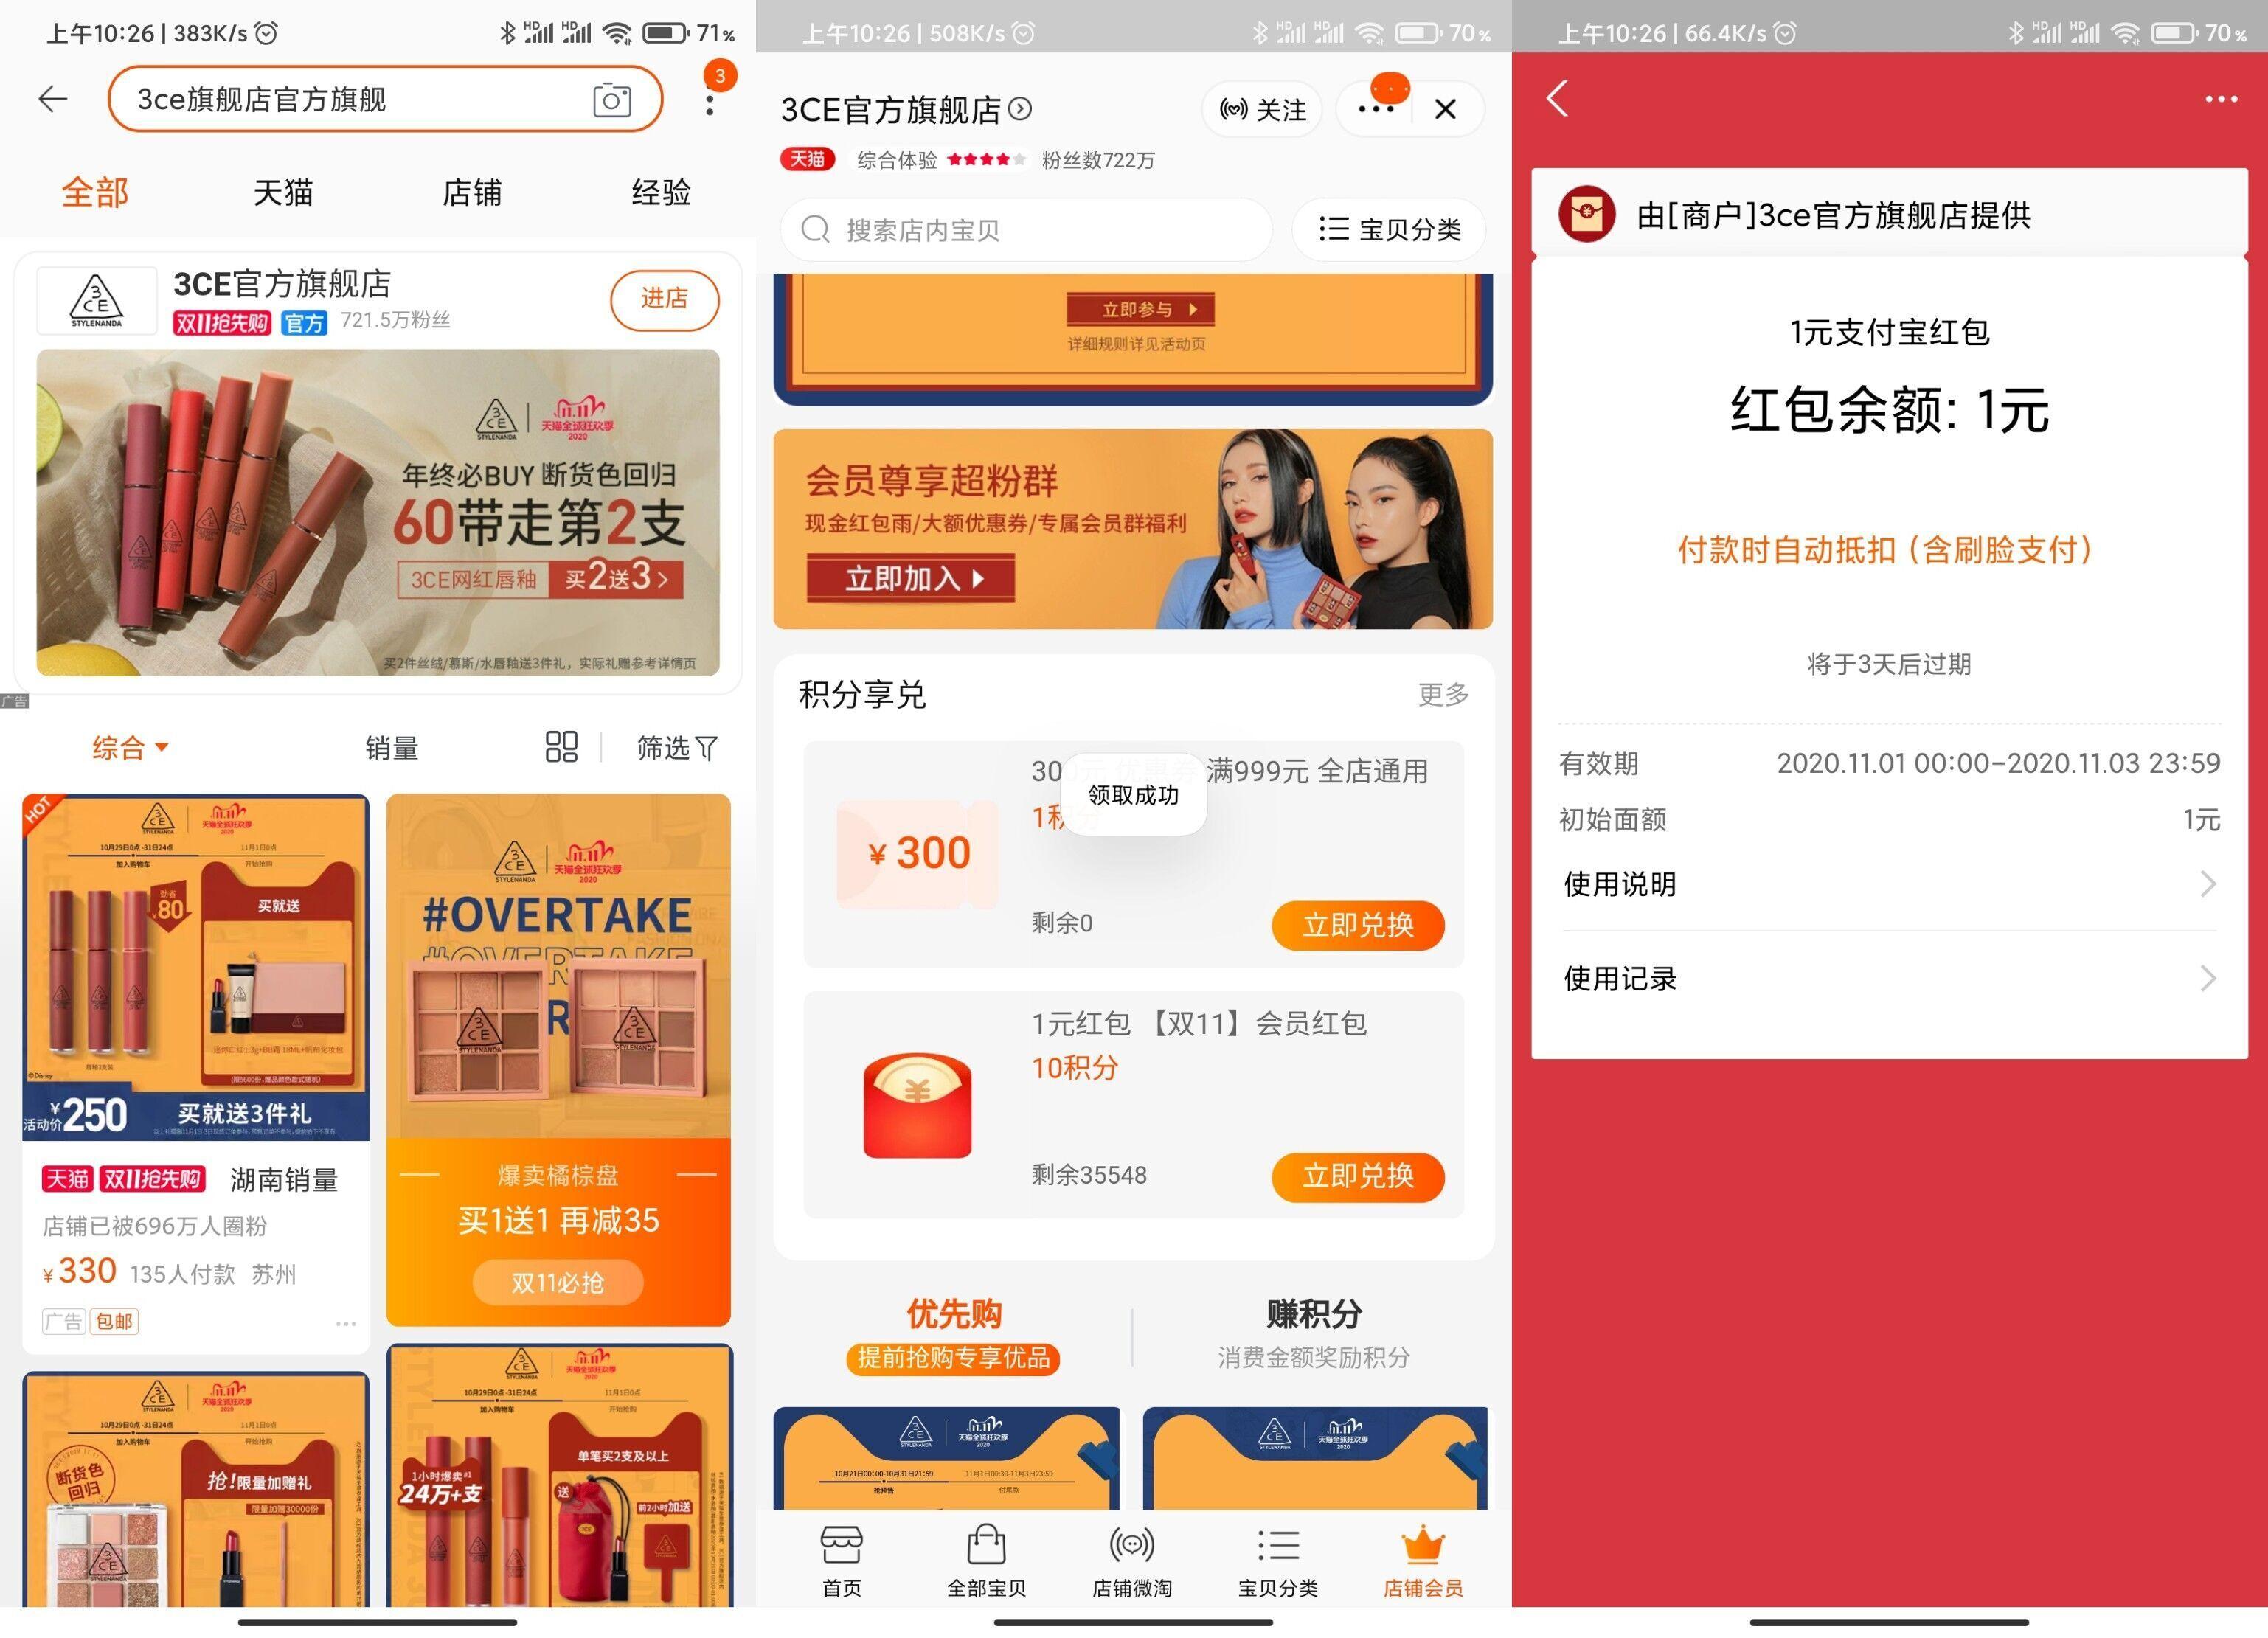 """3CE官方旗舰店""领1元通用红包 11/6最新一期"